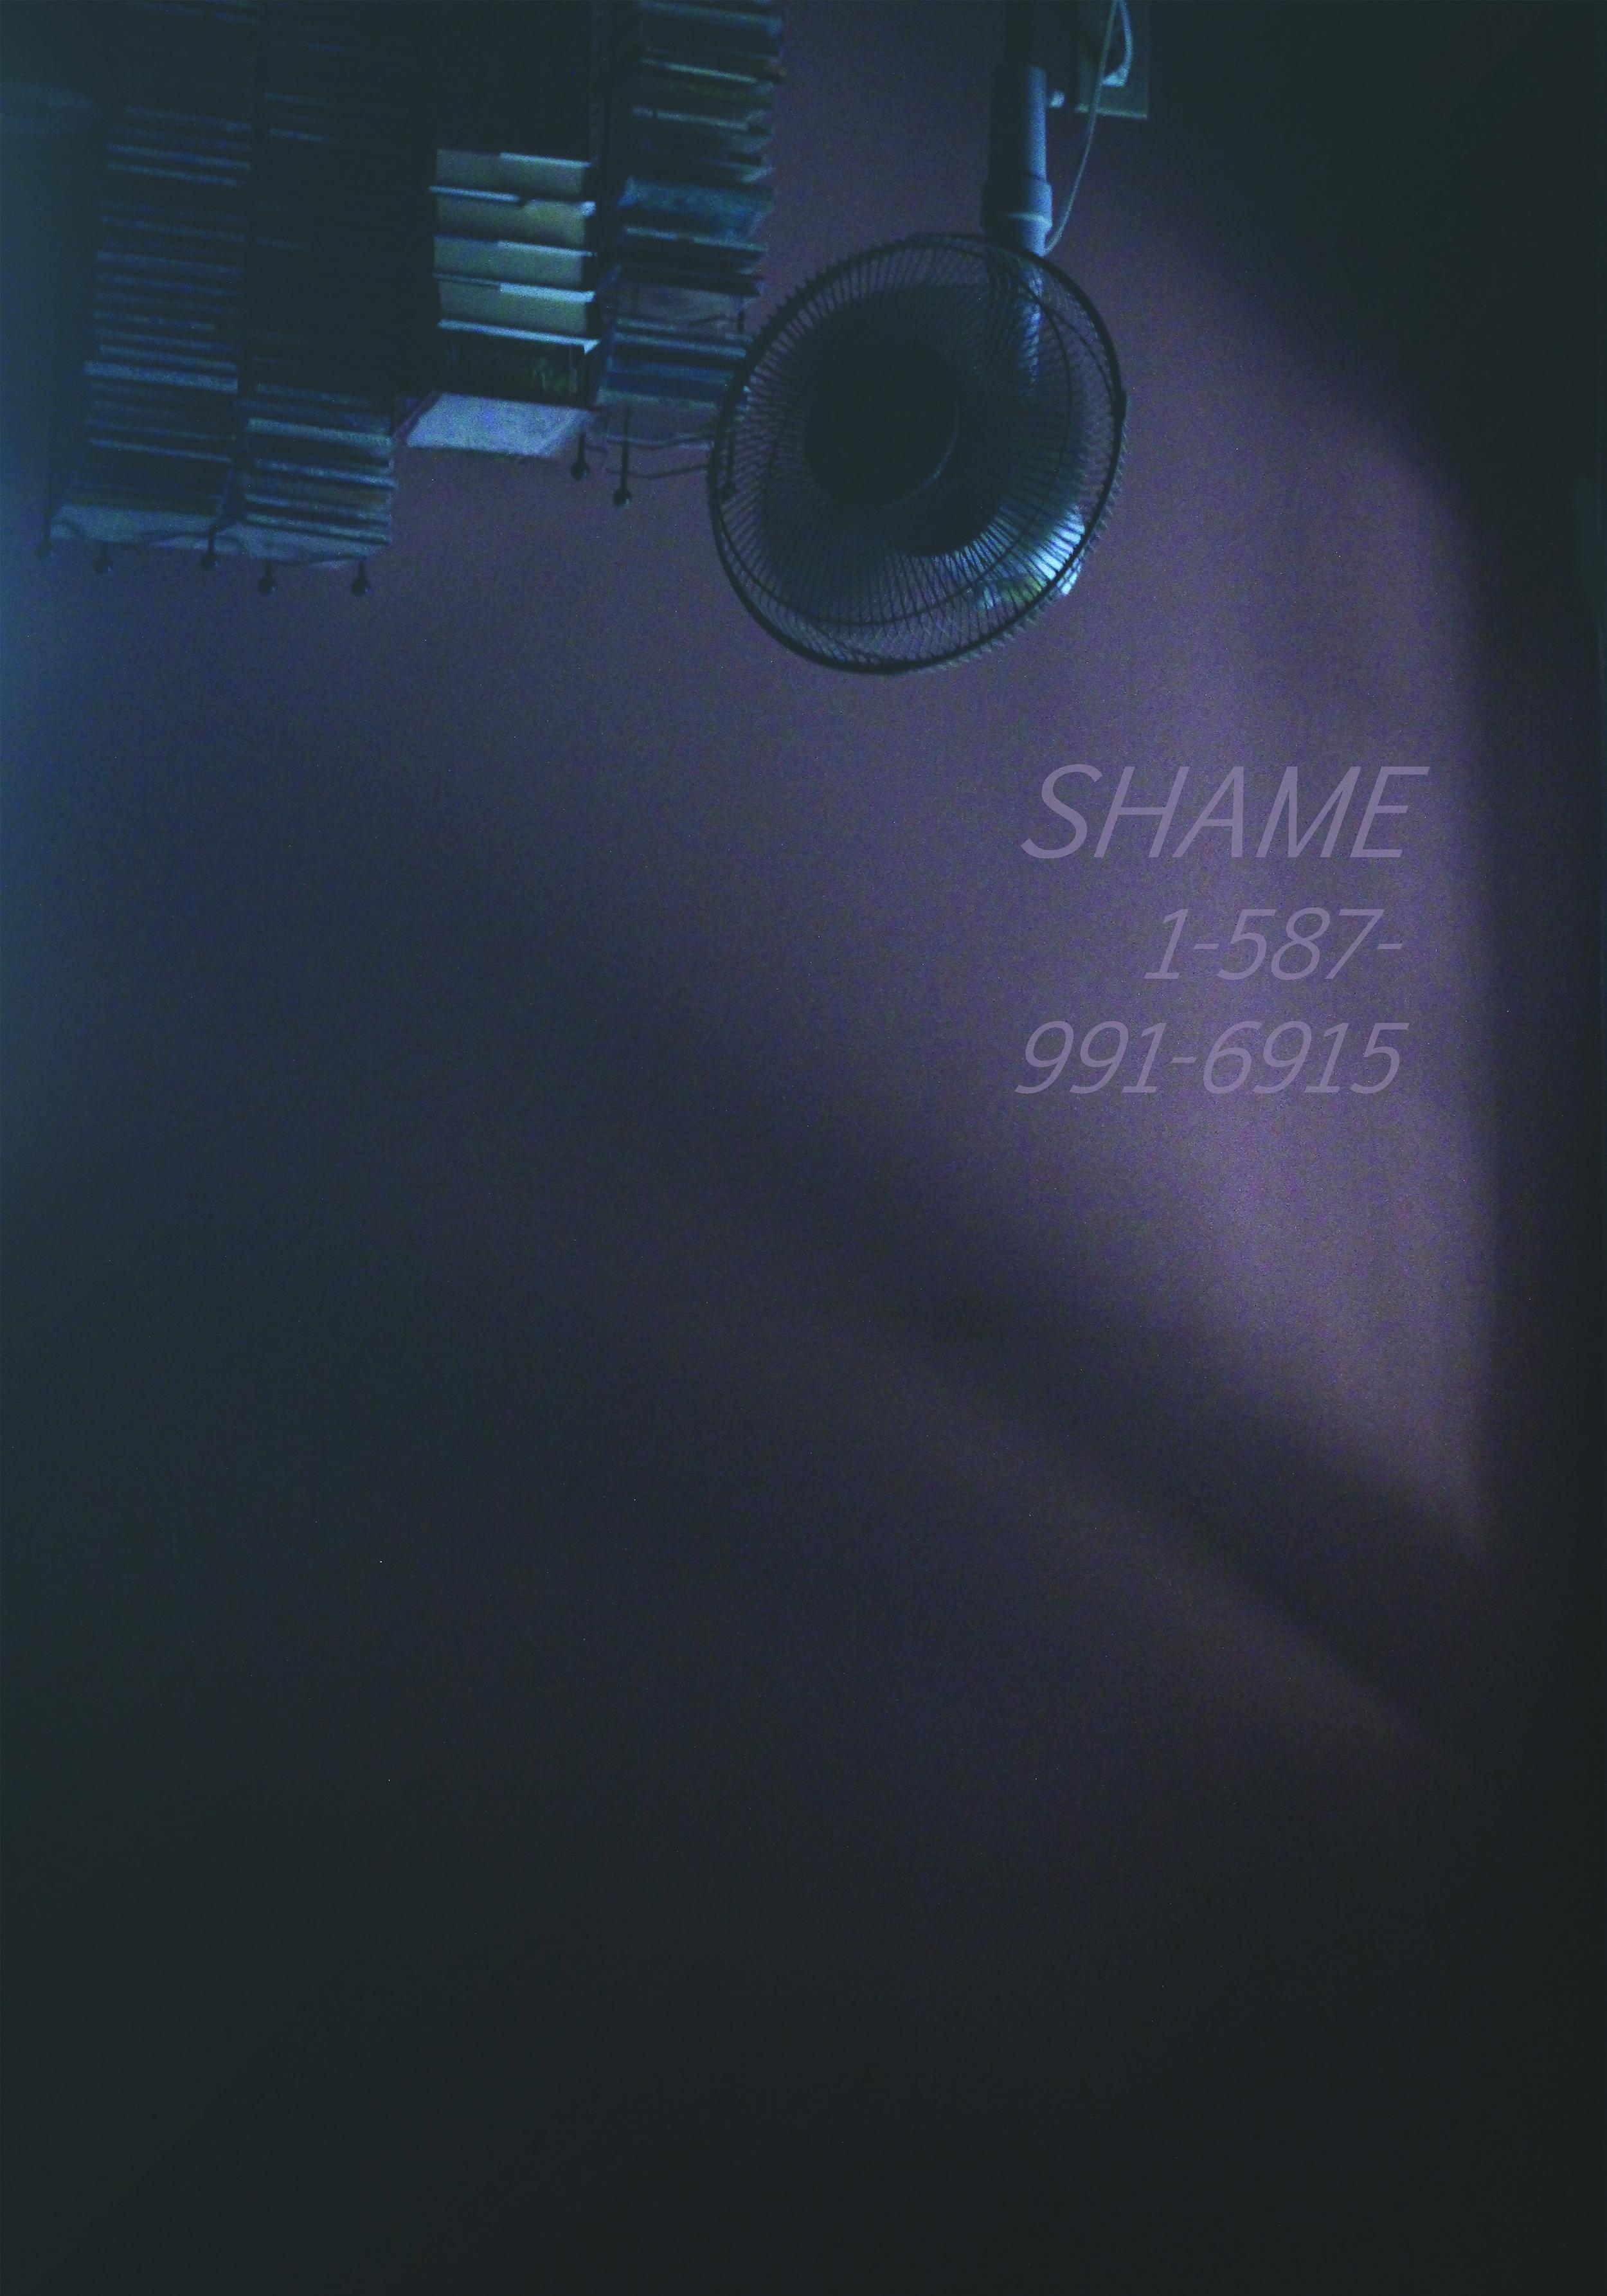 Shame Hotline, 2016